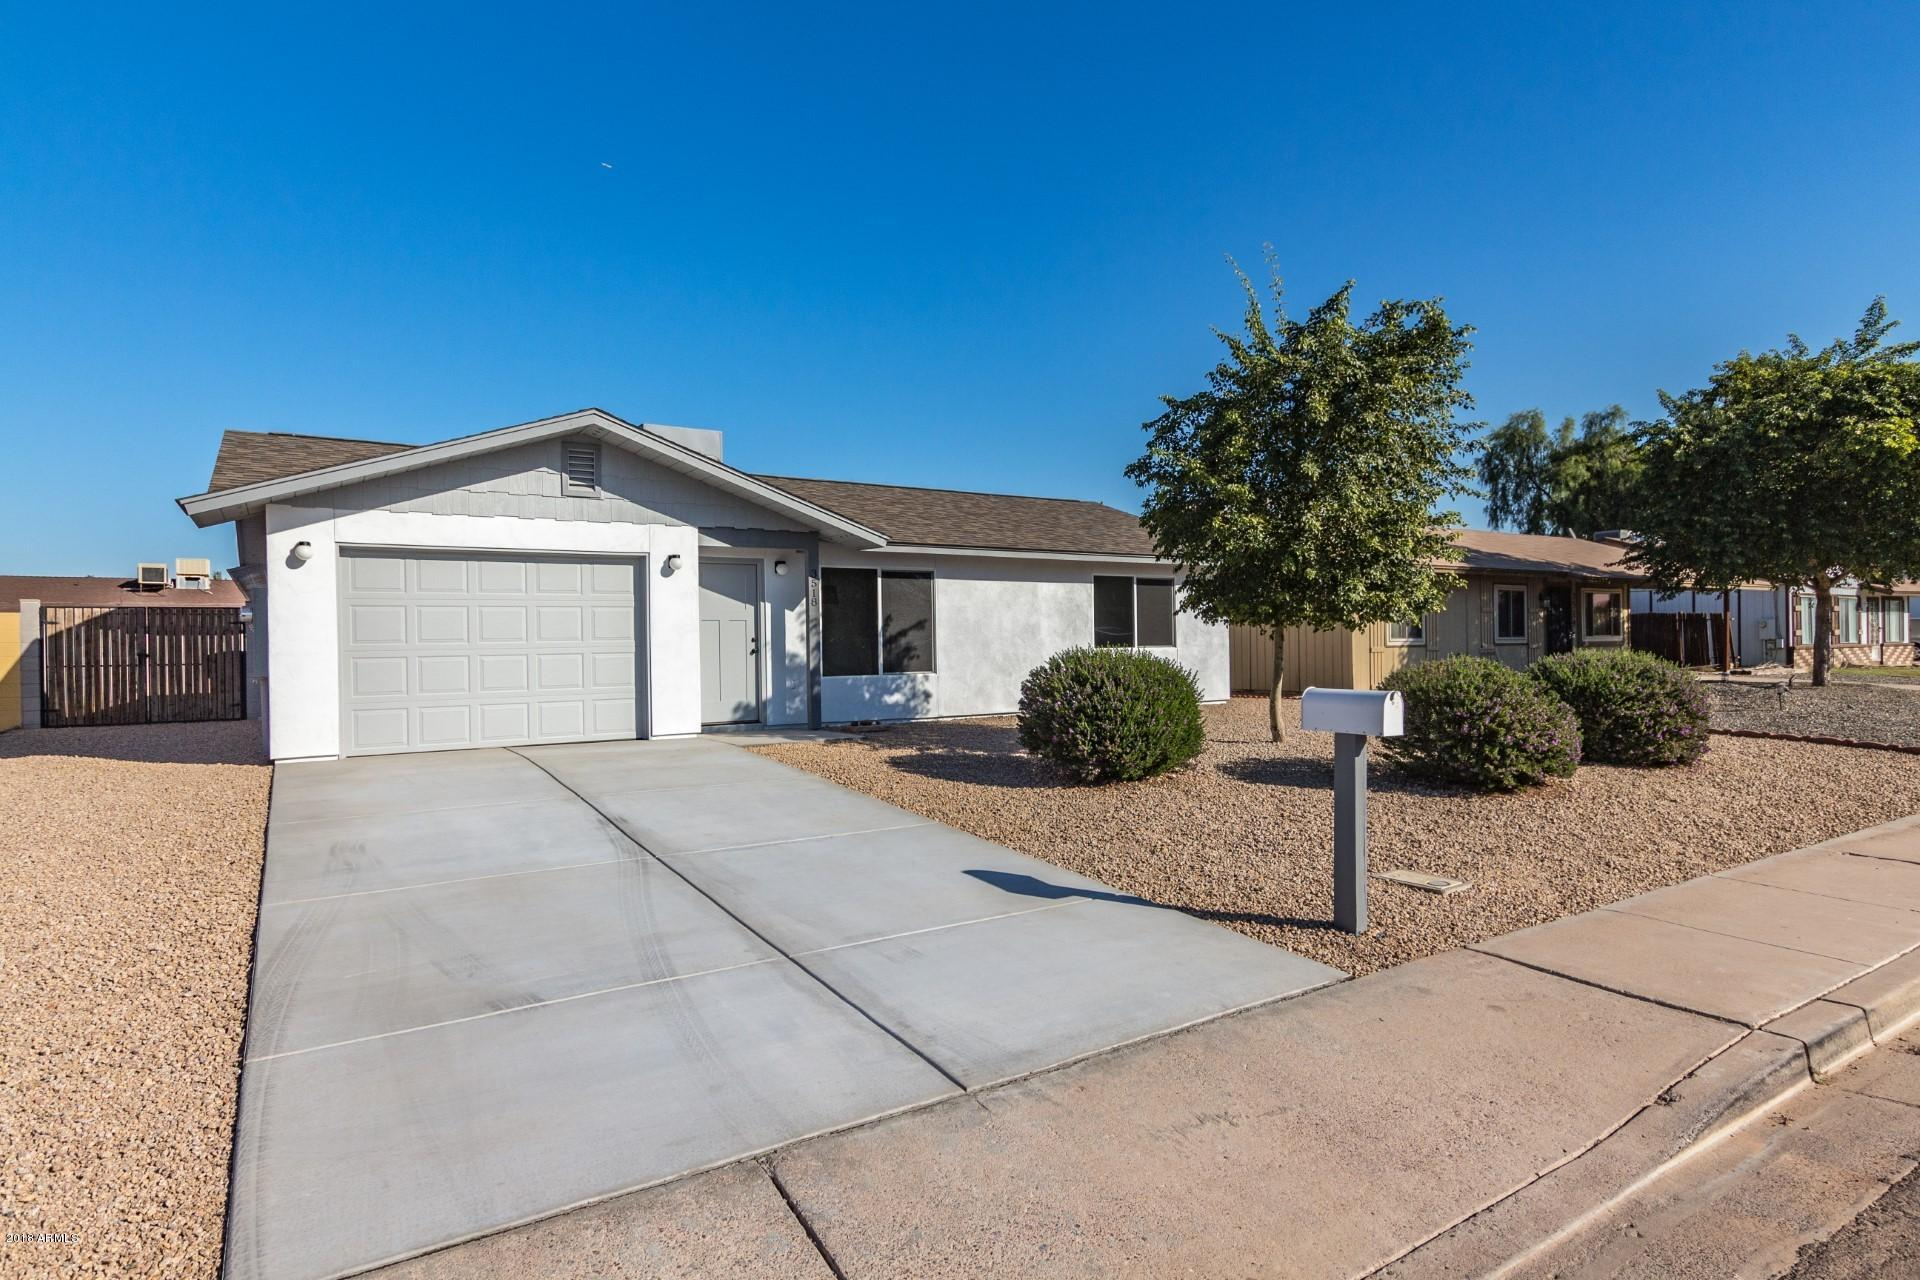 Photo of 3518 W CARLA VISTA Drive, Chandler, AZ 85226